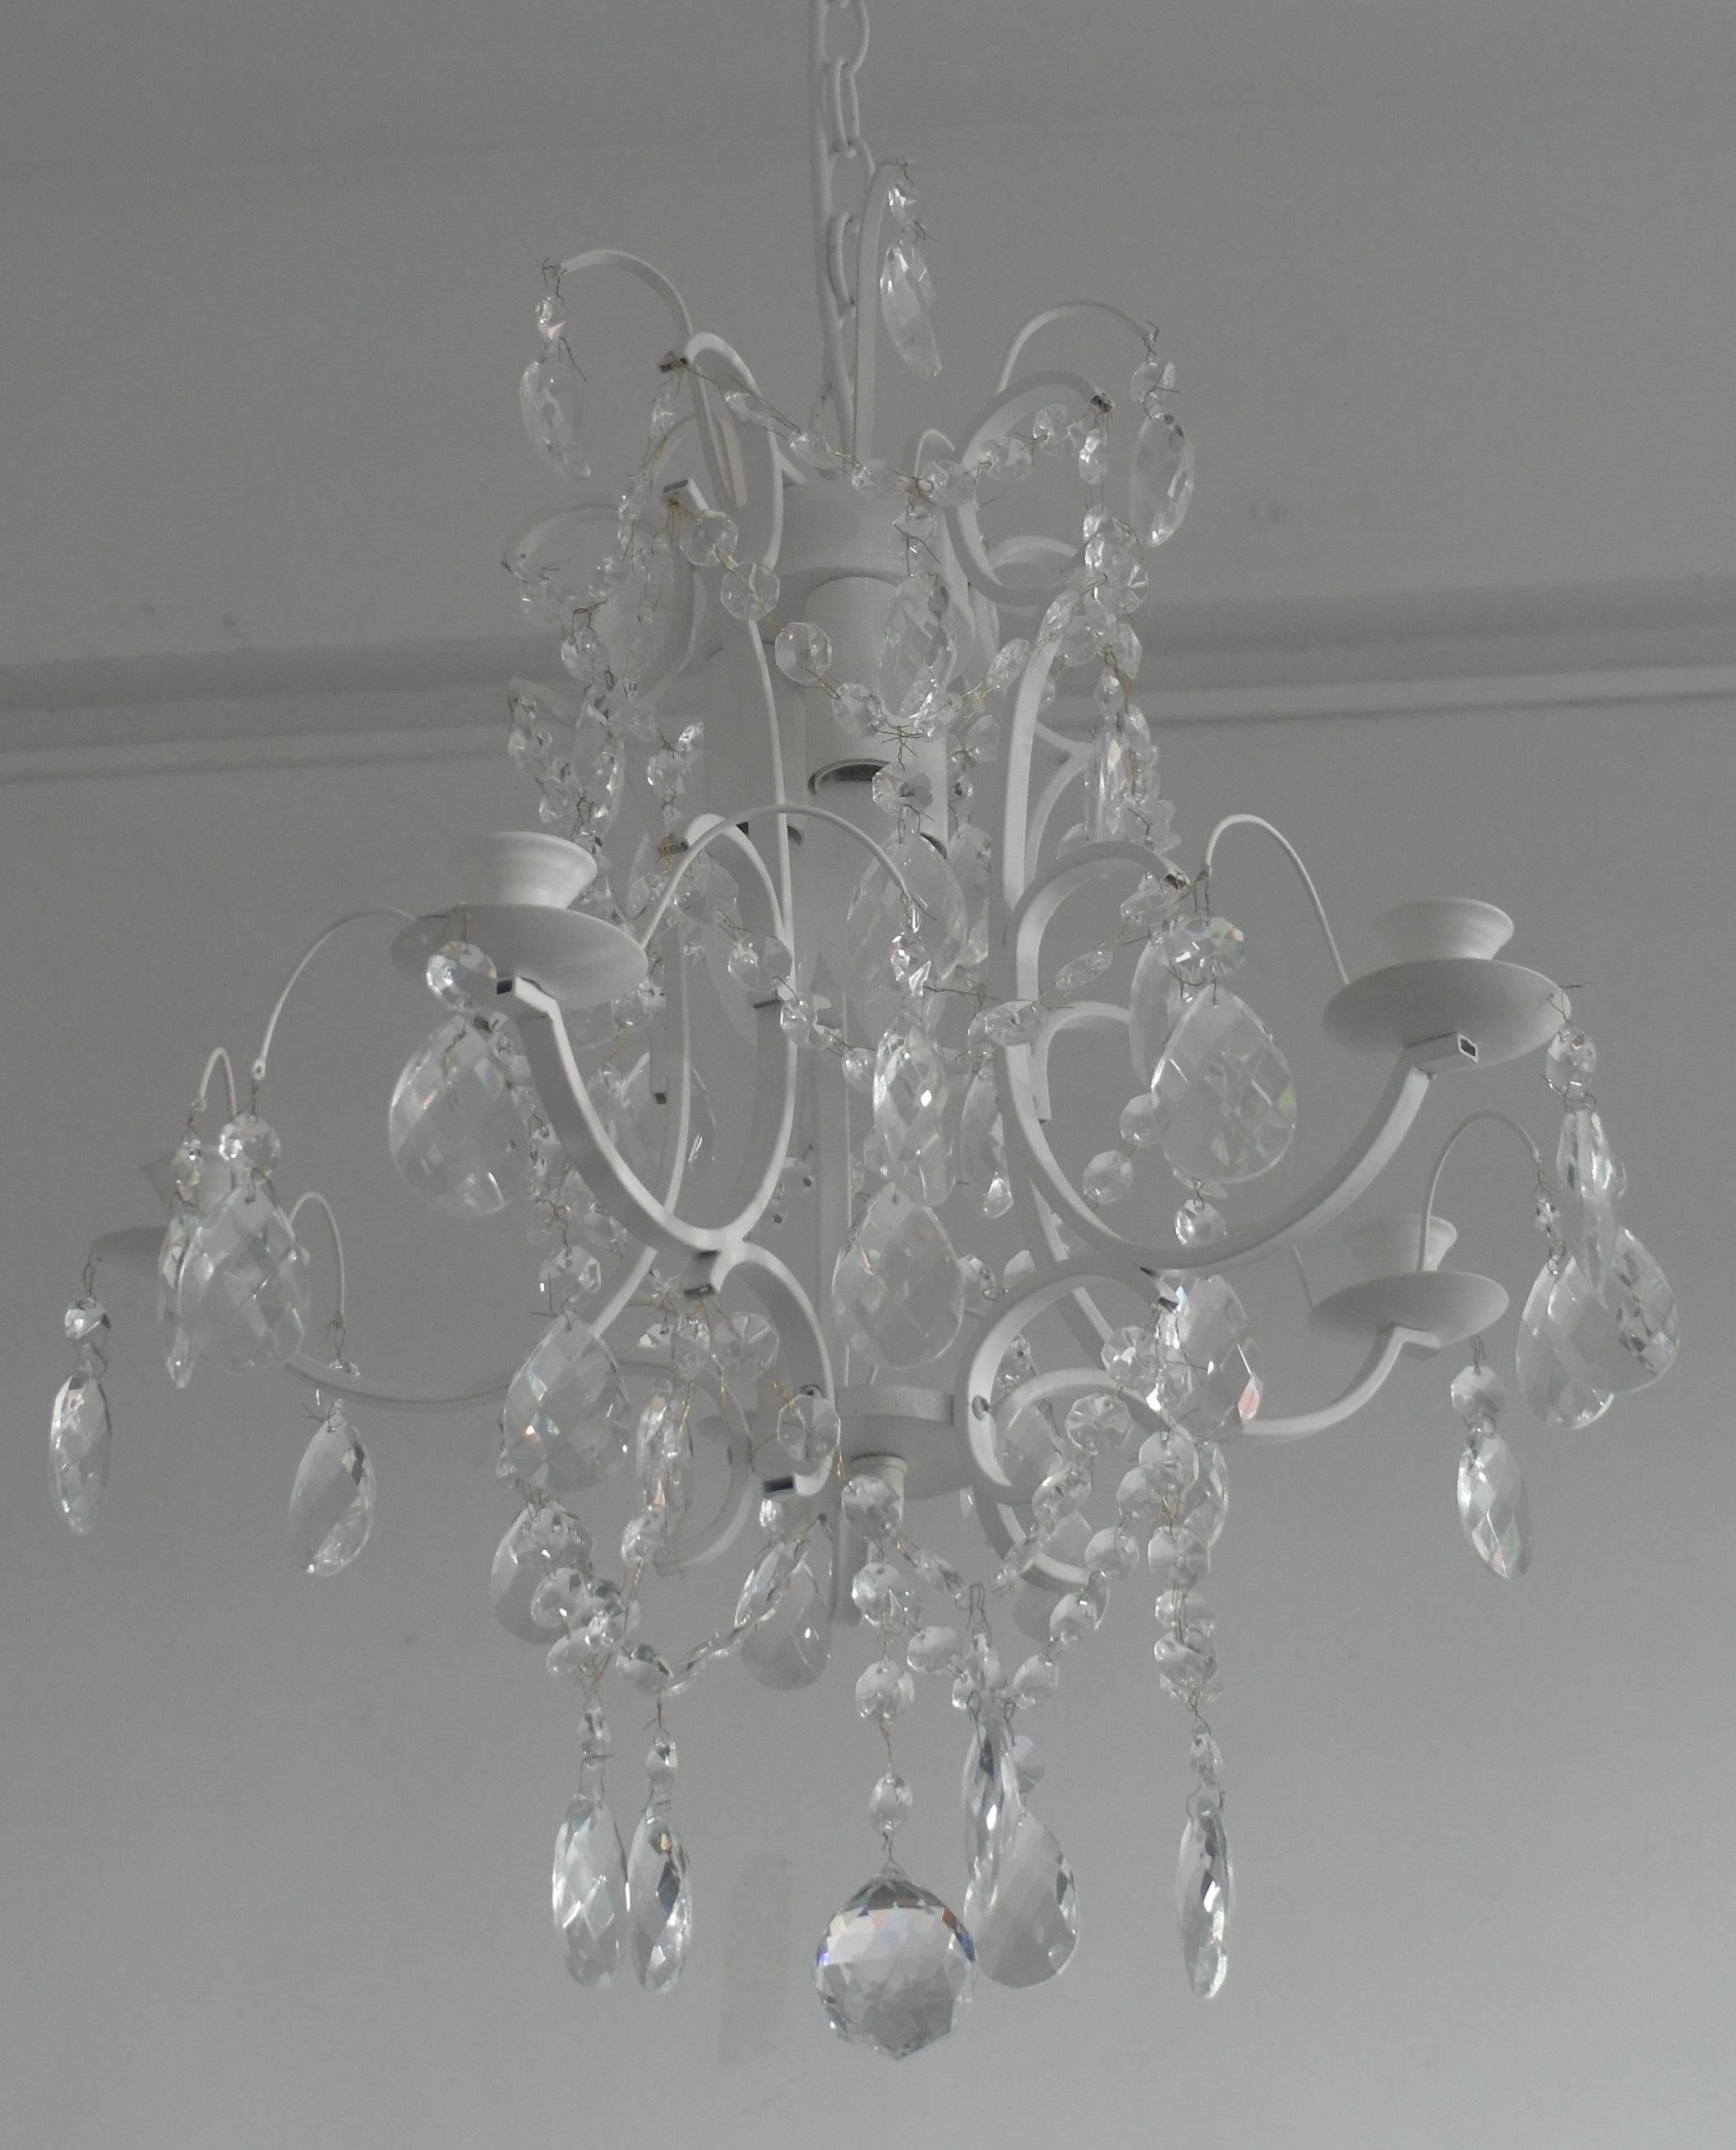 matt white crystalchandeliers/chandeliers/crystal chandelier/5 lights chandeliers